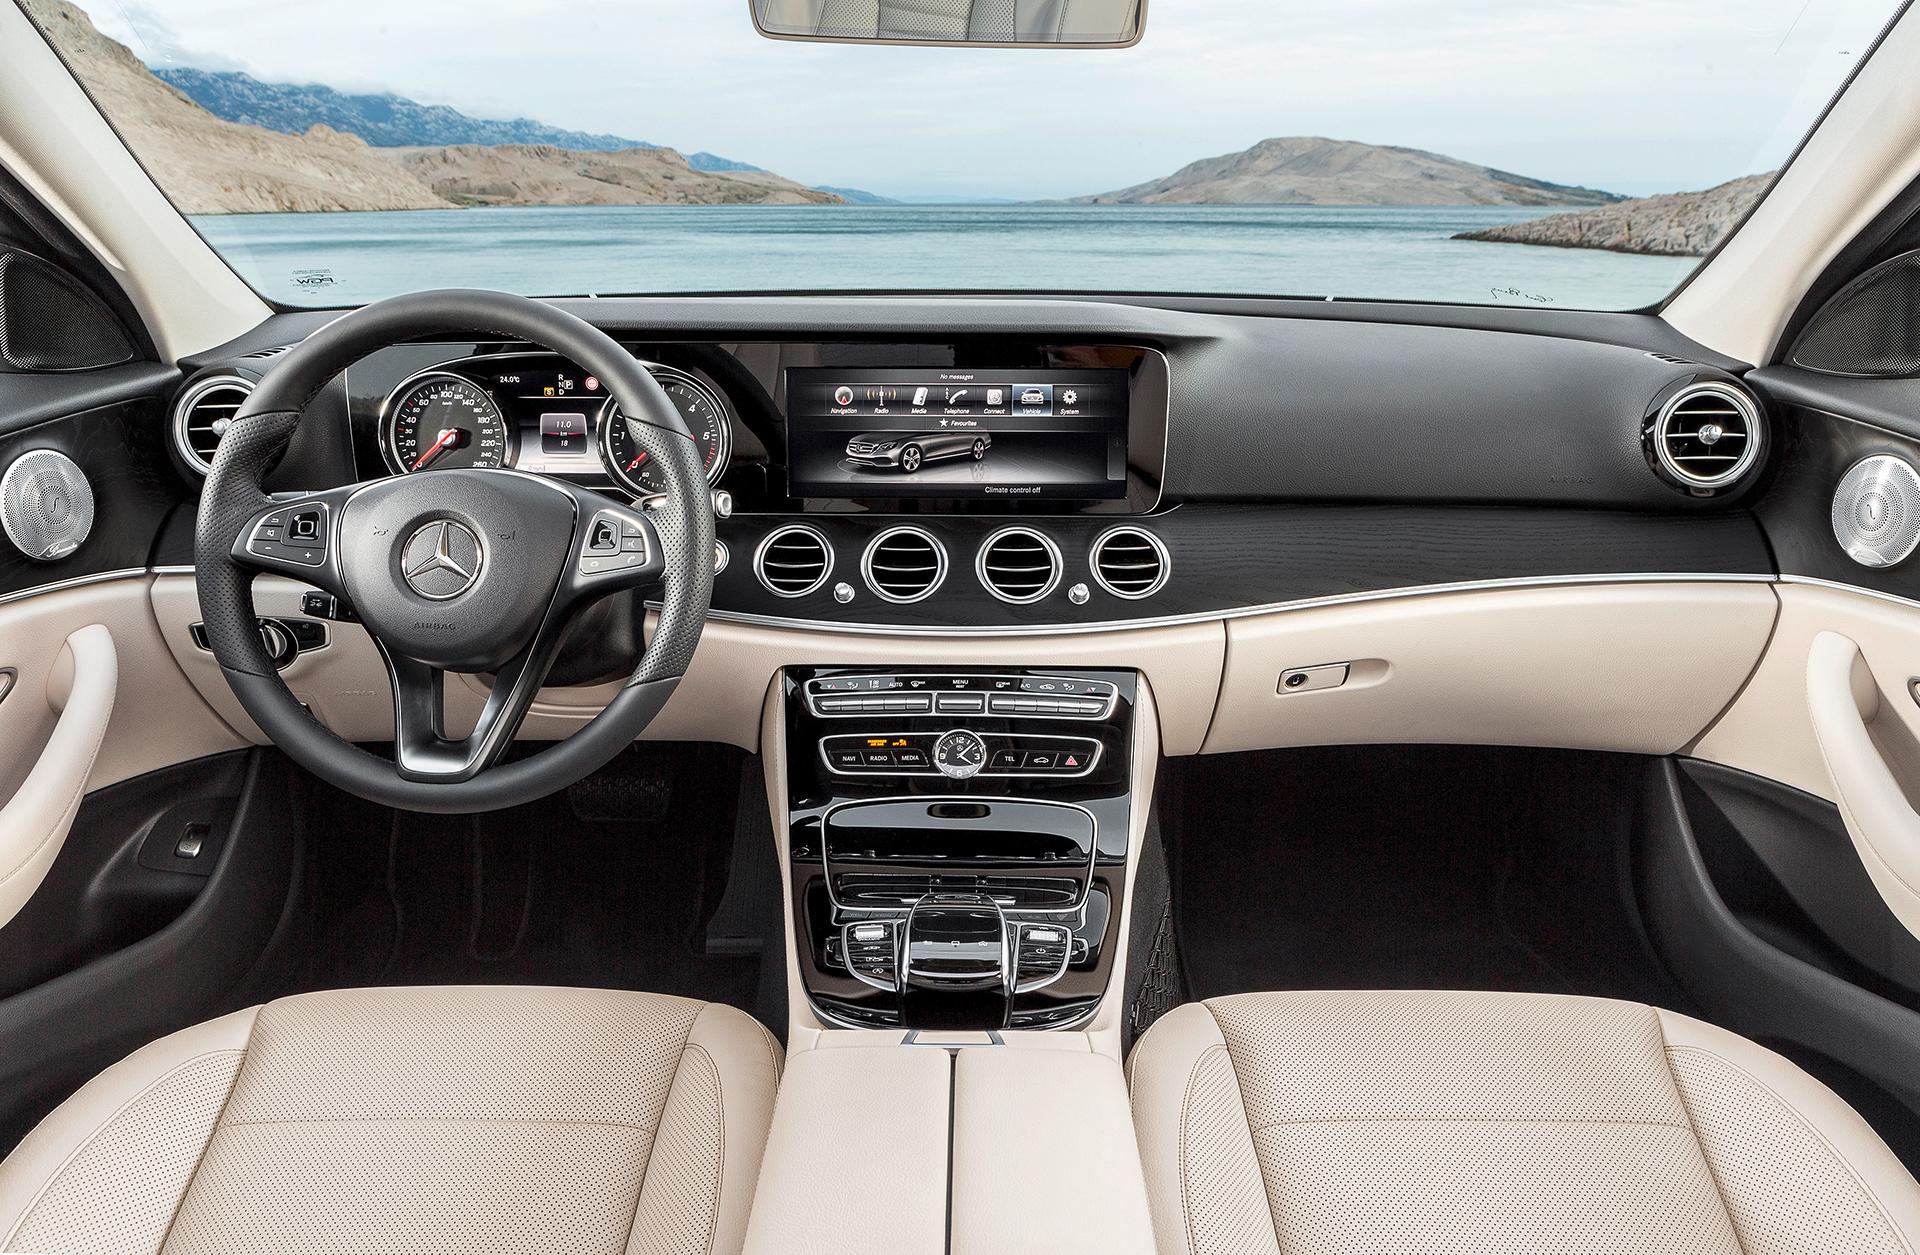 Mercedes-Benz E Class - 2016 - interior / intérieur